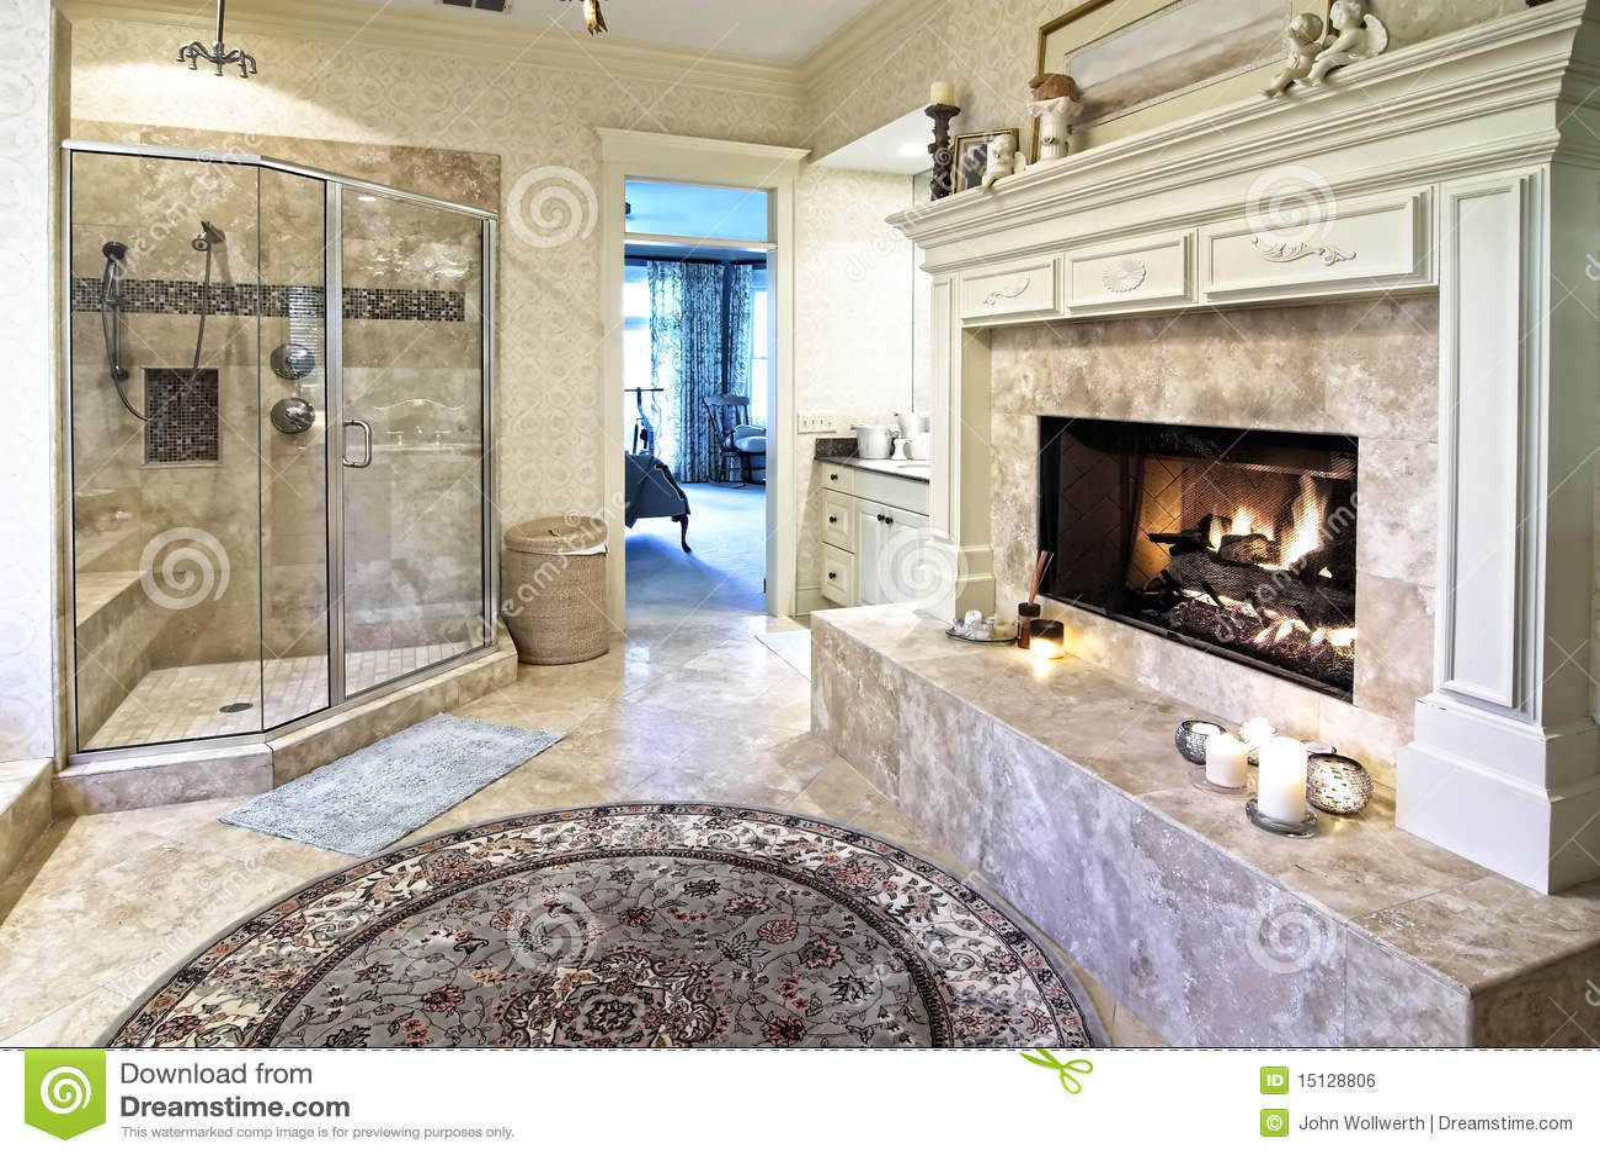 Opulent Bathroom 50 Royalty Free Stock Image Image 15128806